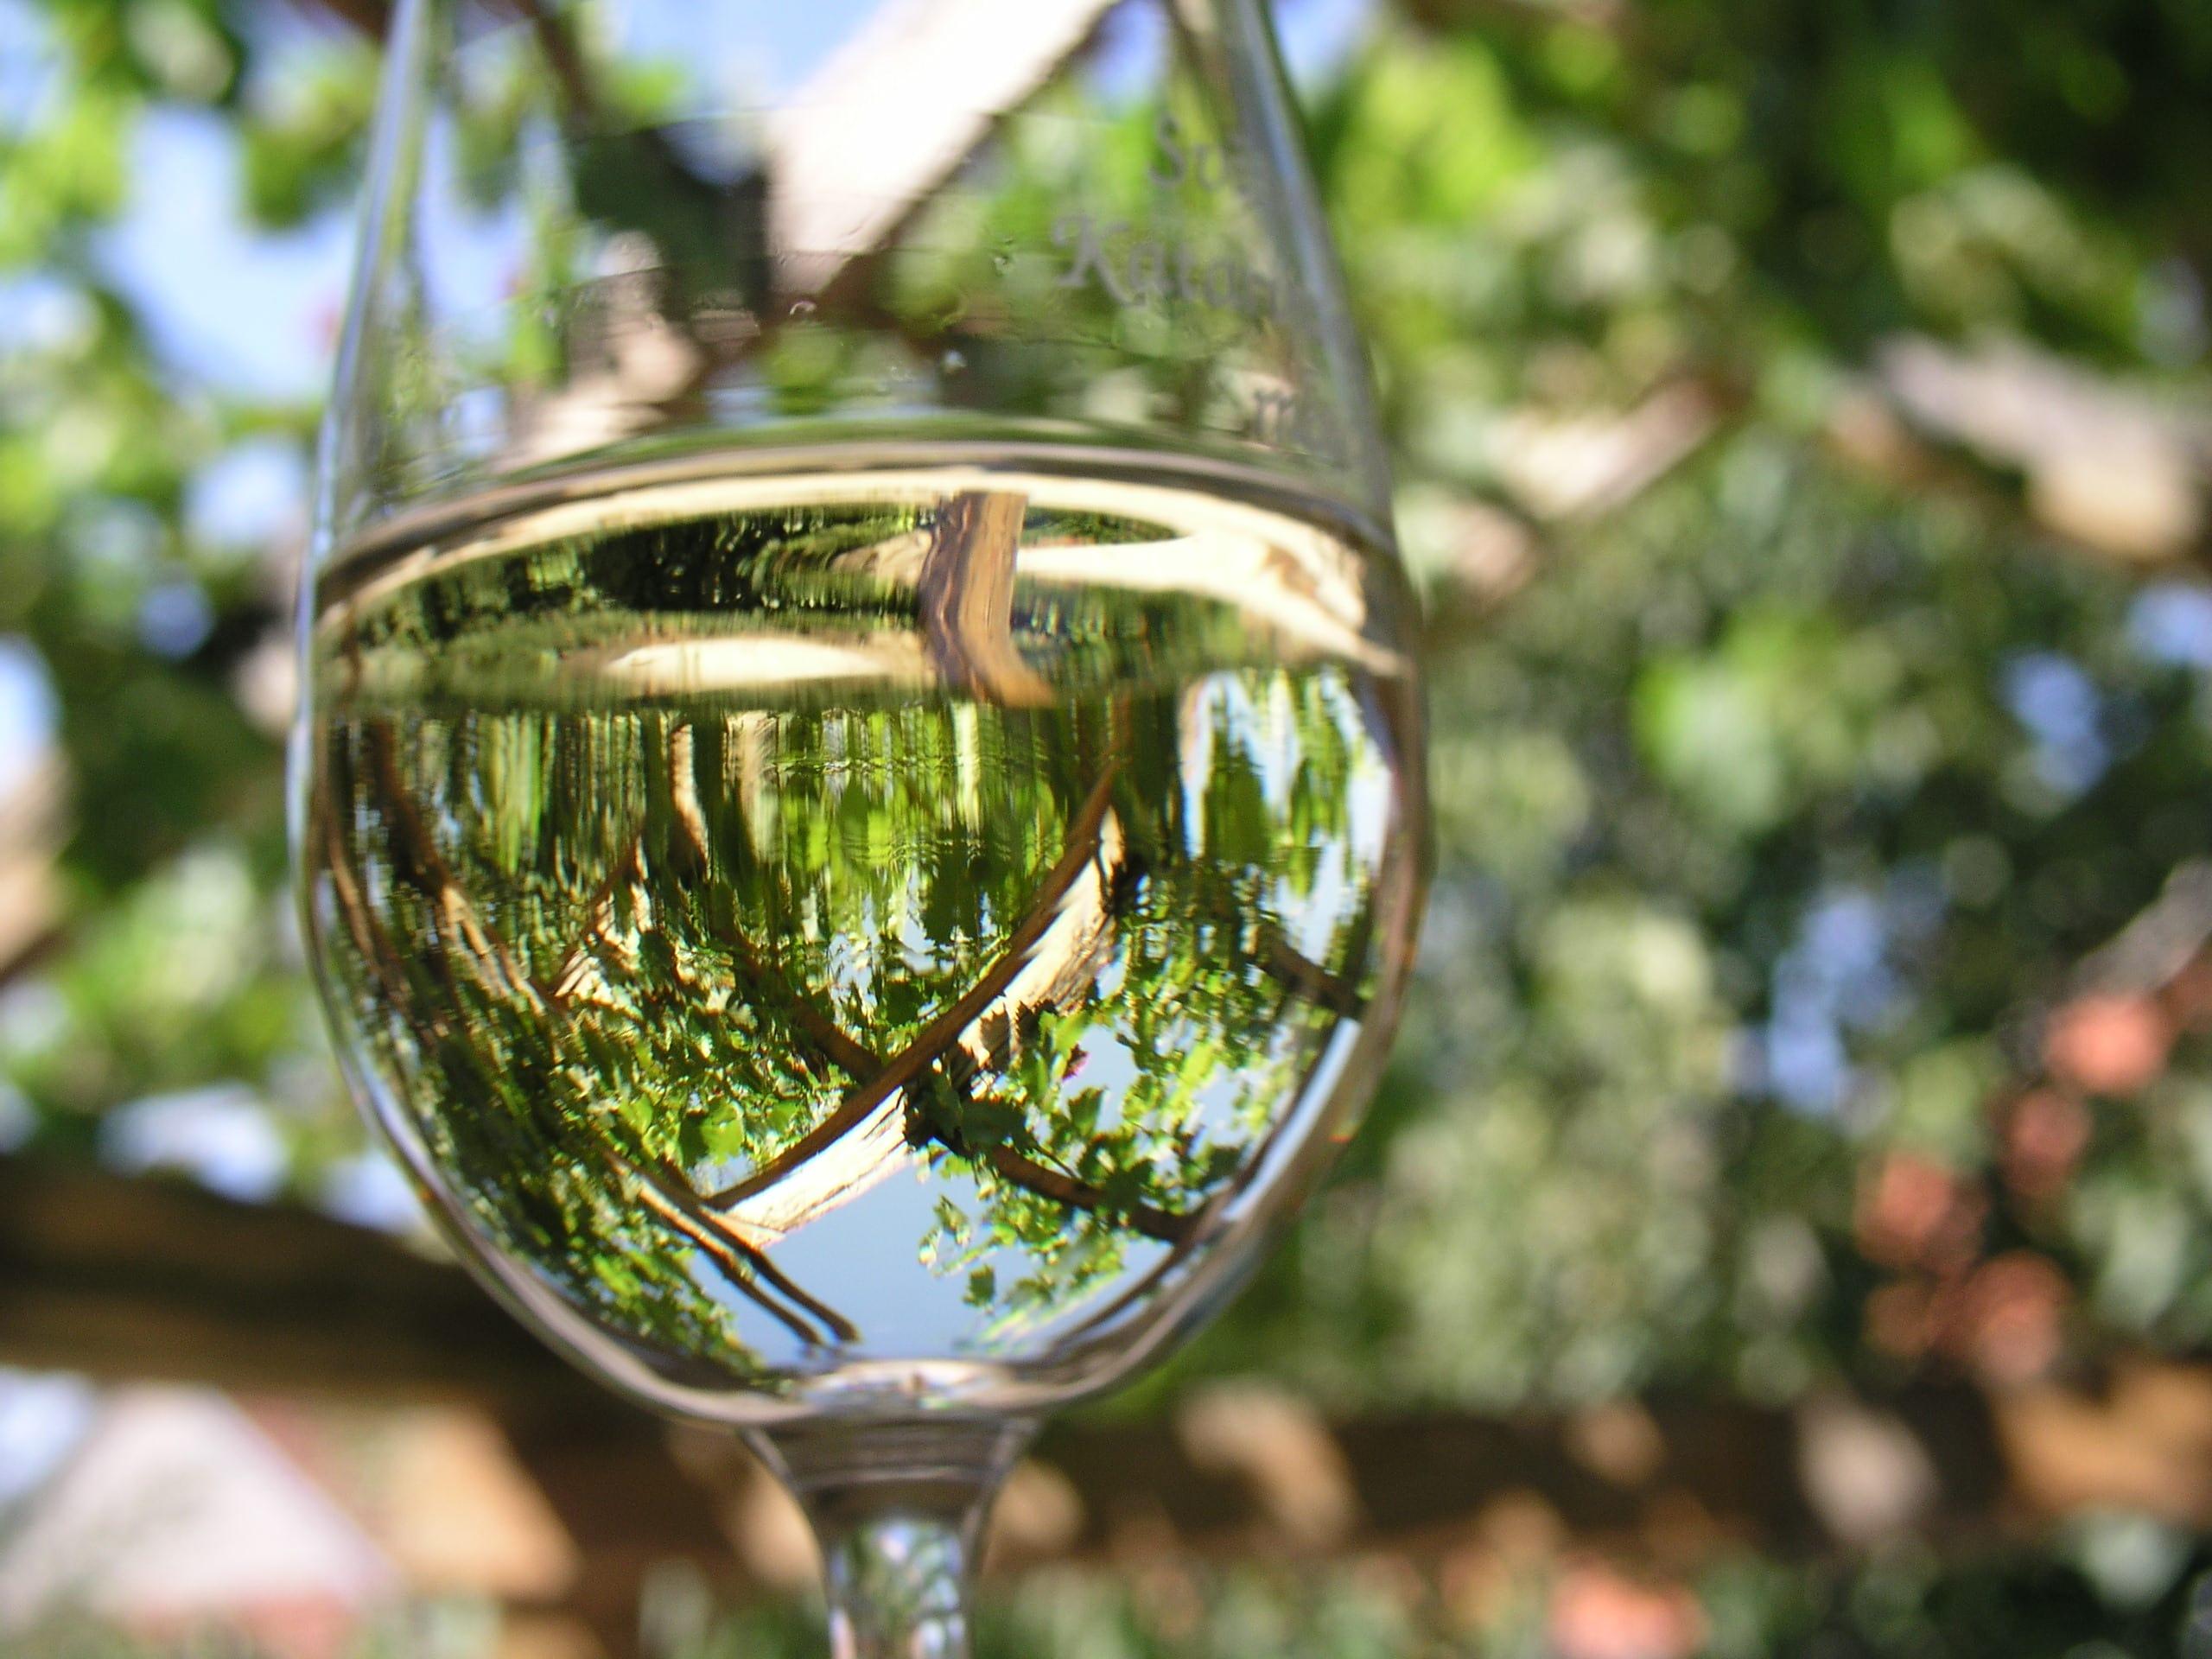 vinarstvo4_Vinarstvo Kopecek-min